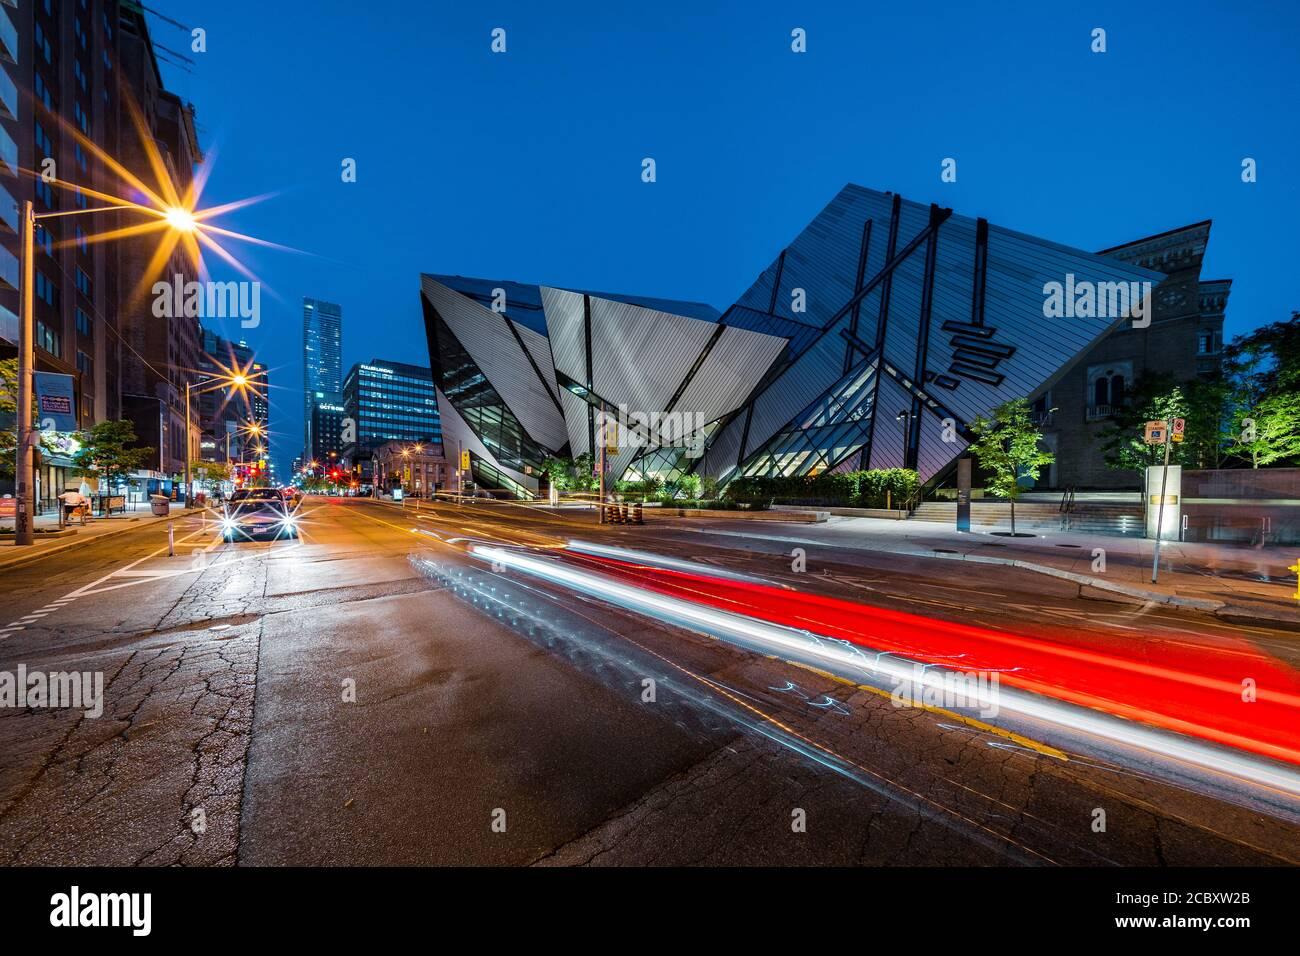 Night view of architectural landmark Royal Ontario Museum aka the ROM in Toronto, Ontario, Canada. Stock Photo